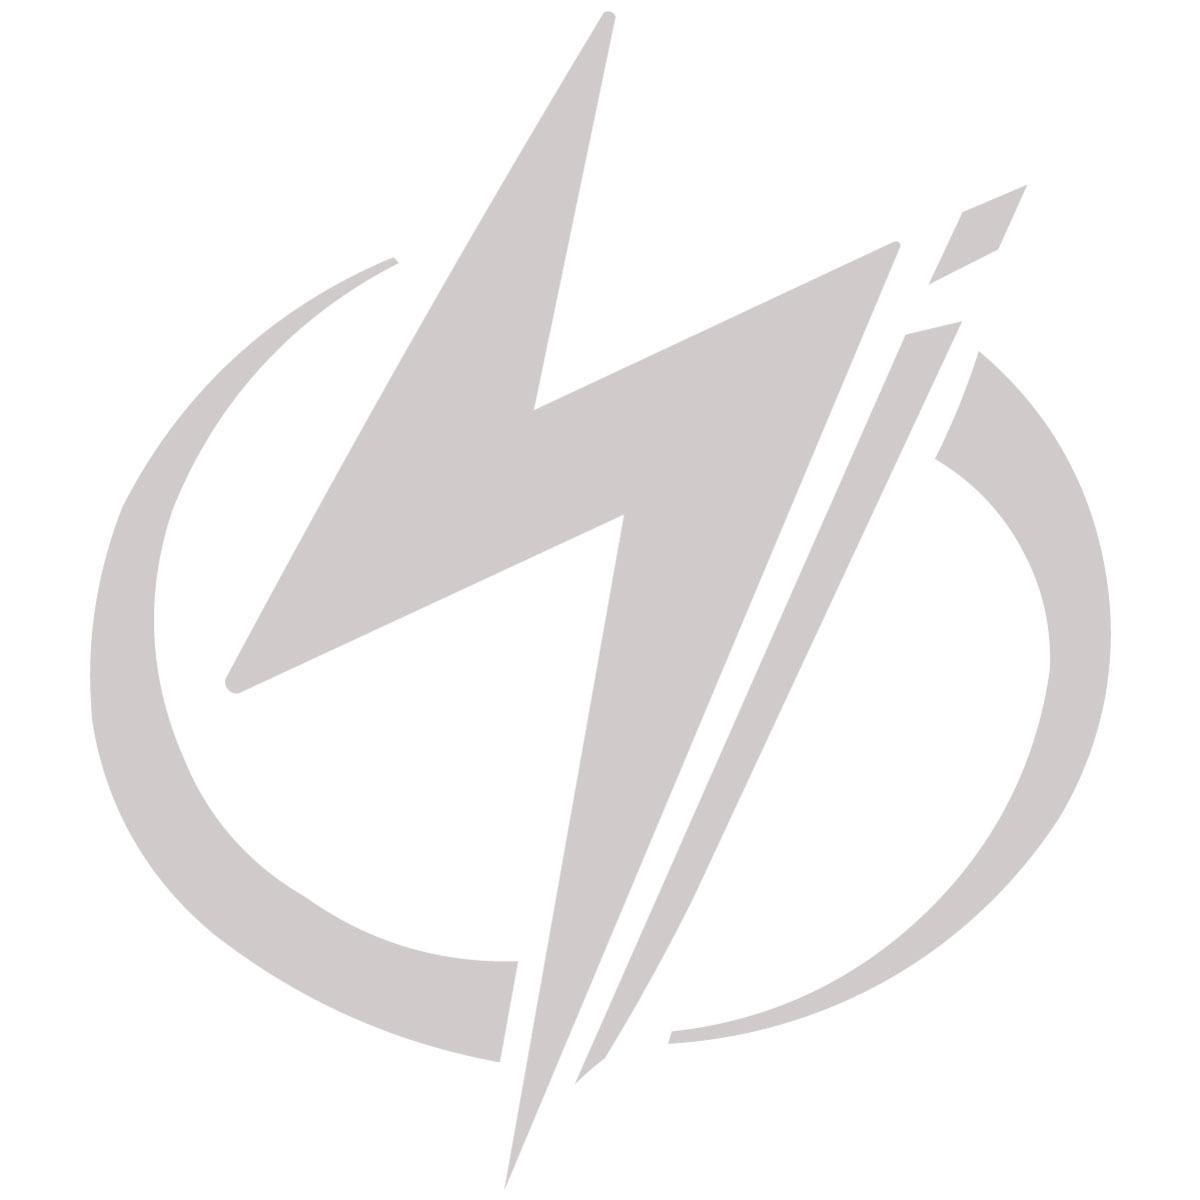 SiForce Lightning X (Hardware Defined Forensics)